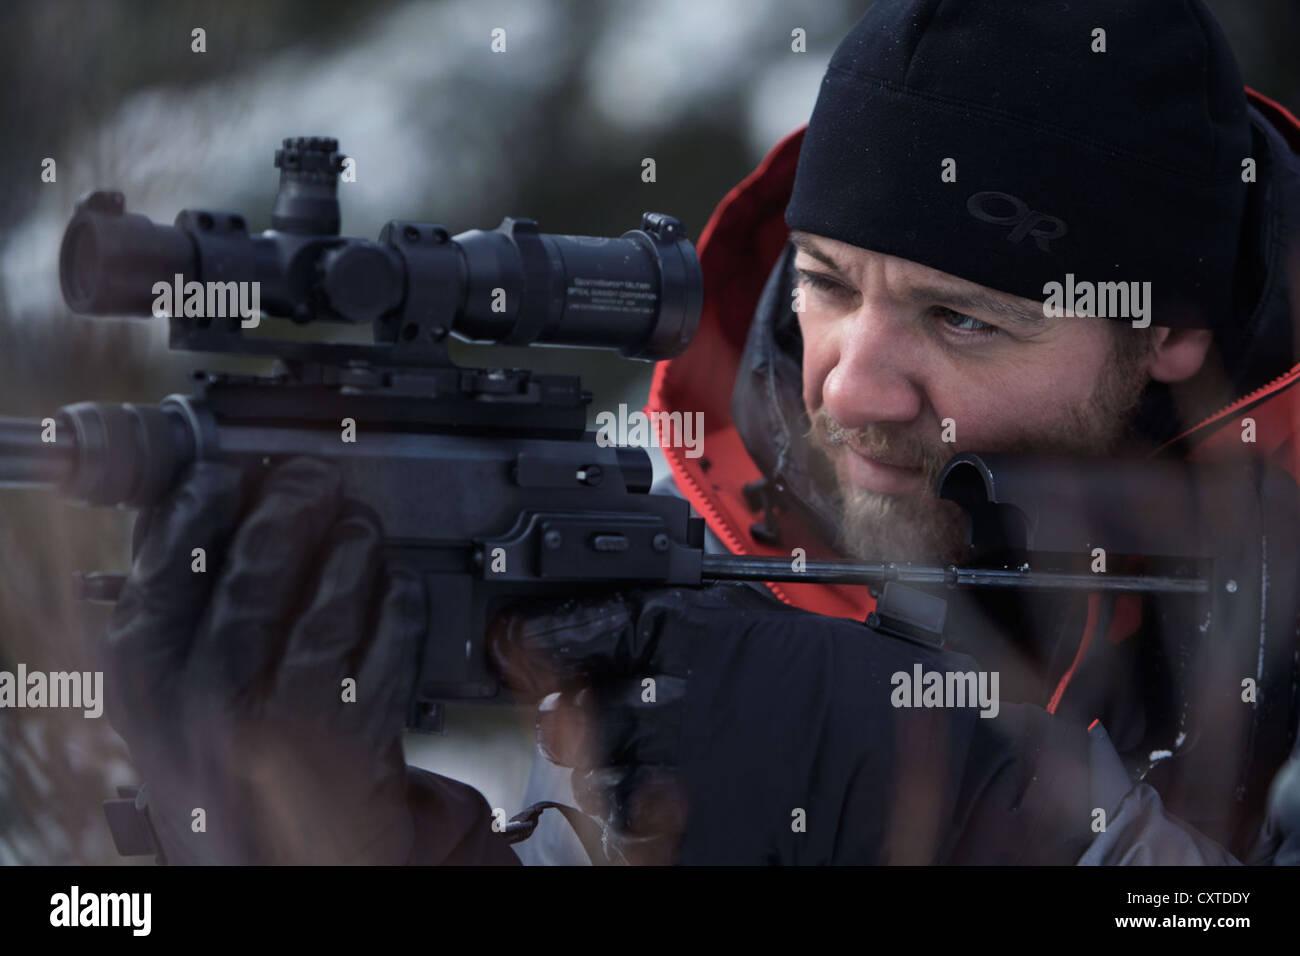 The Bourne Legacy 2012 Jeremy Renner Tony Gilroy Dir 006 Stock Photo Alamy